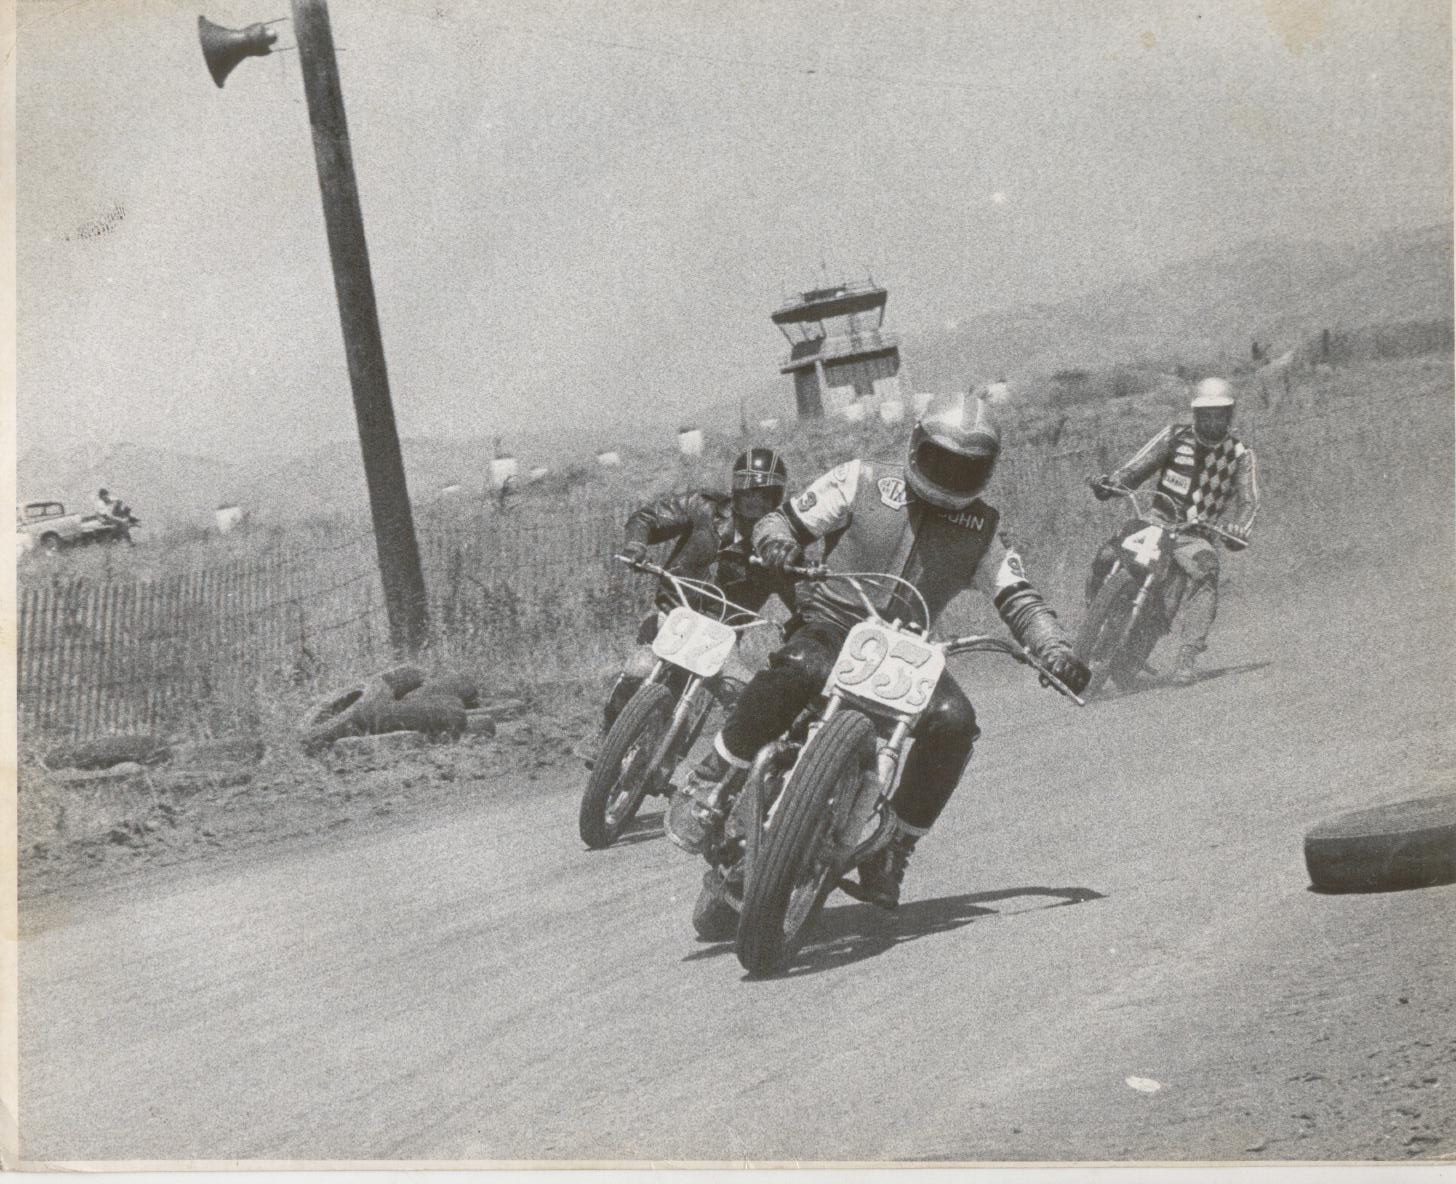 vintage flat track racing